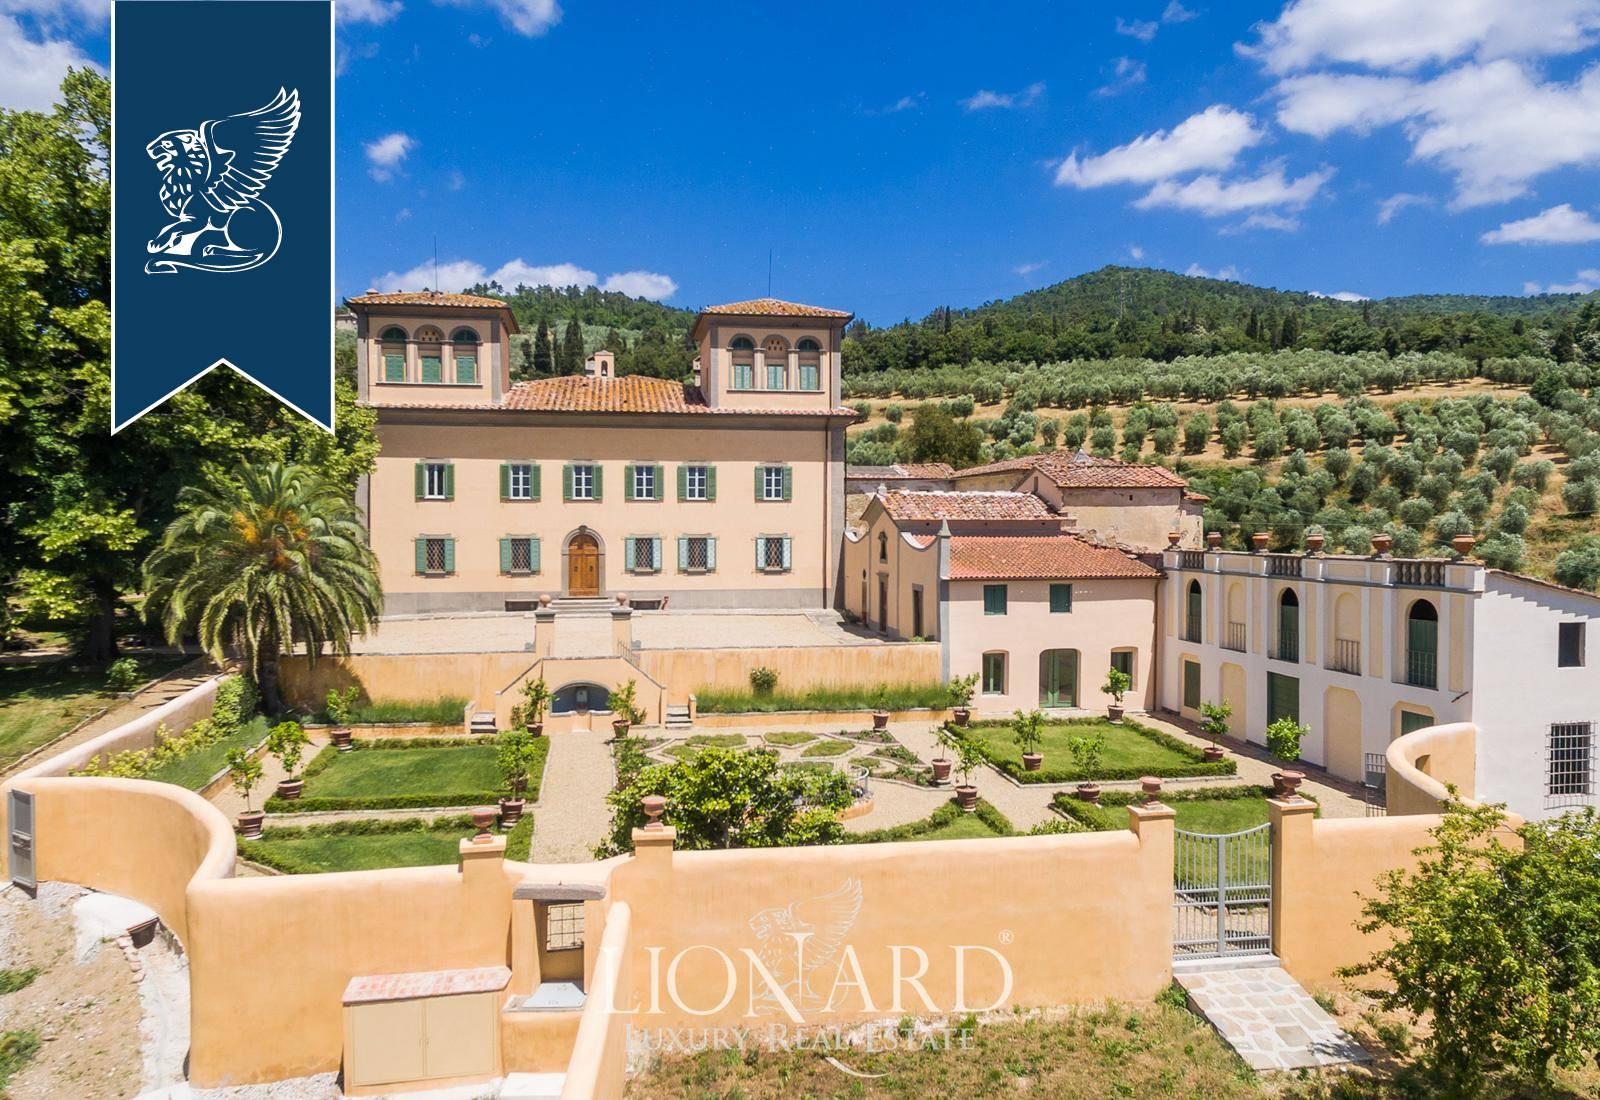 Villa in Vendita a Vinci: 0 locali, 5246 mq - Foto 2